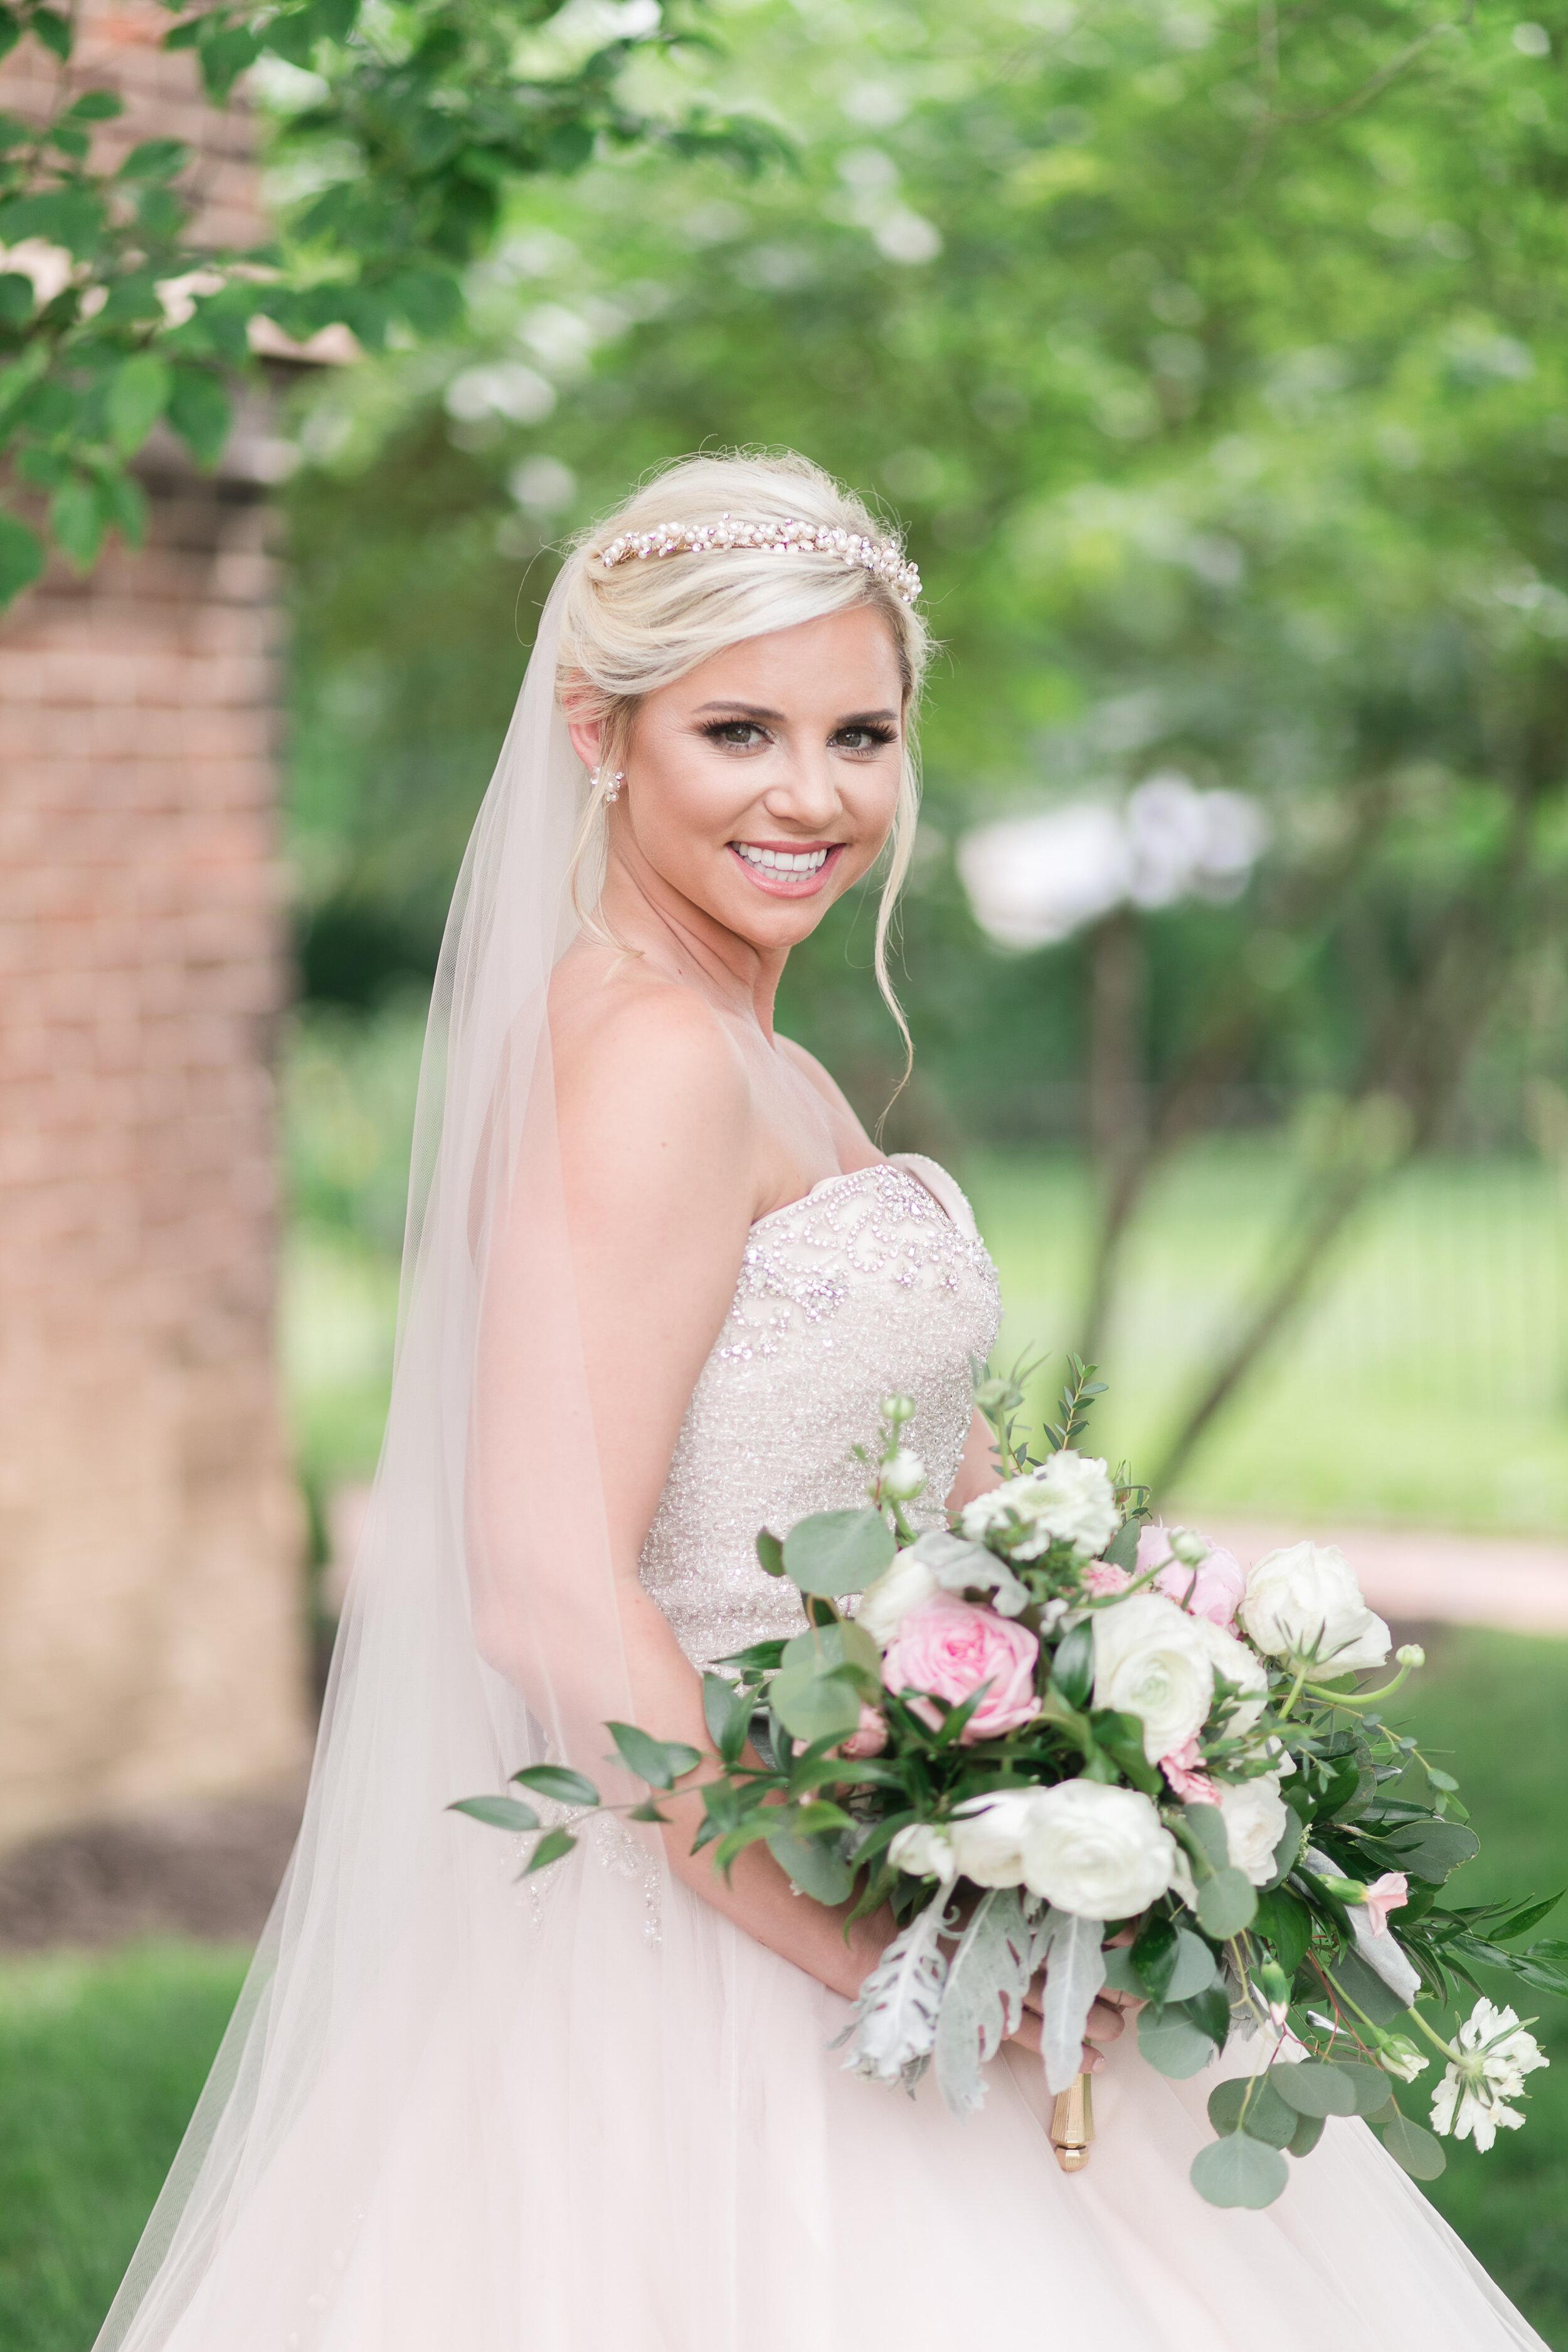 Holly-David-wedding-425.jpg